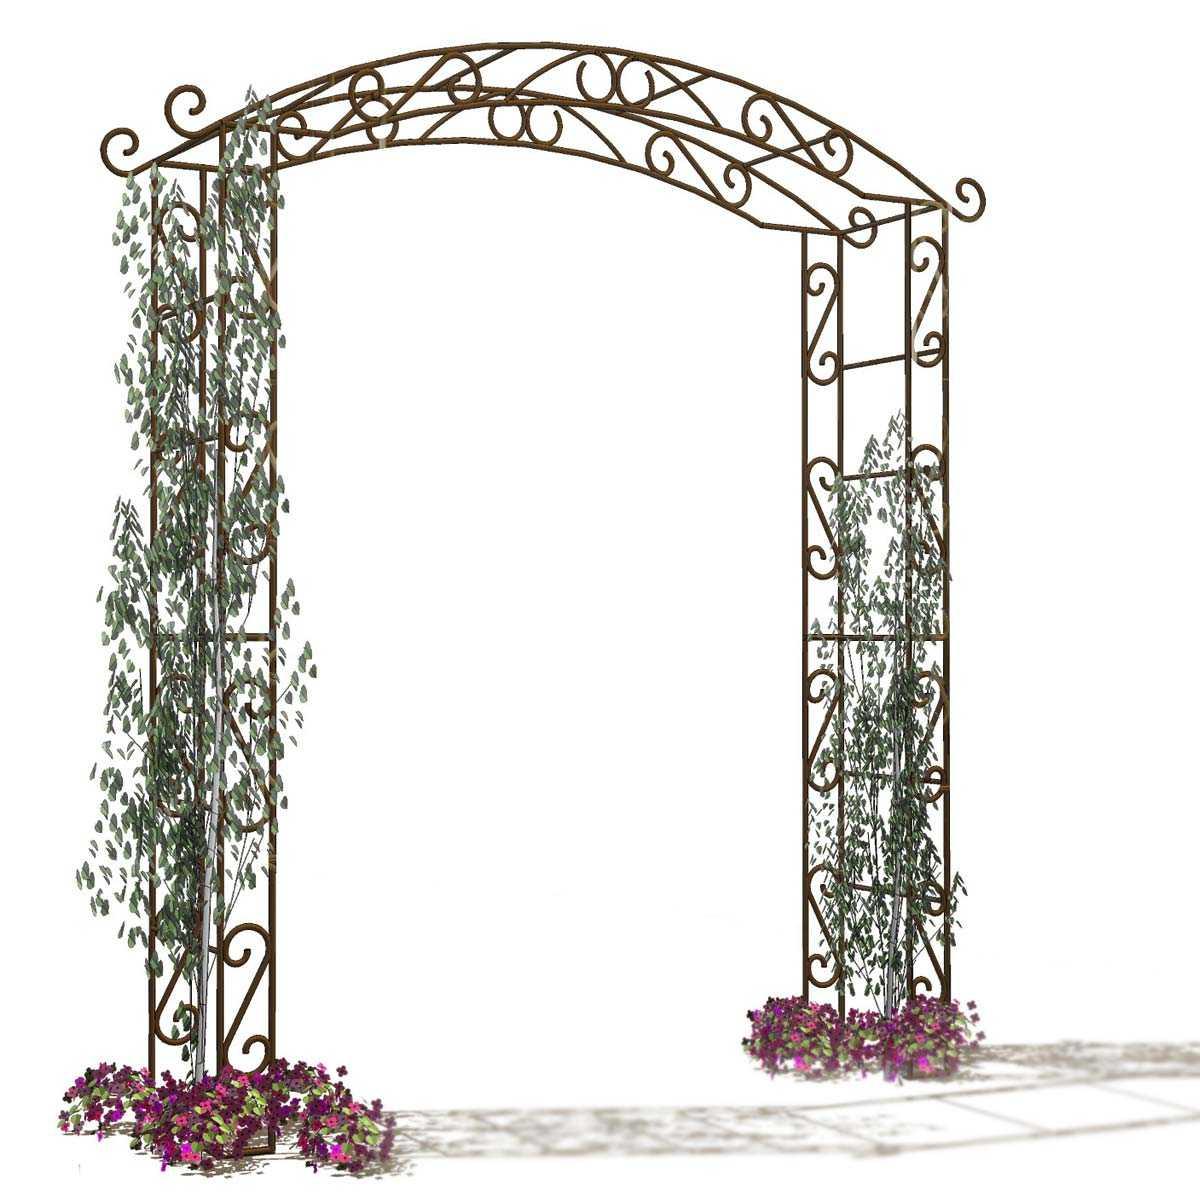 Arche De Jardin En Fer Pagode concernant Arche Jardin Bois